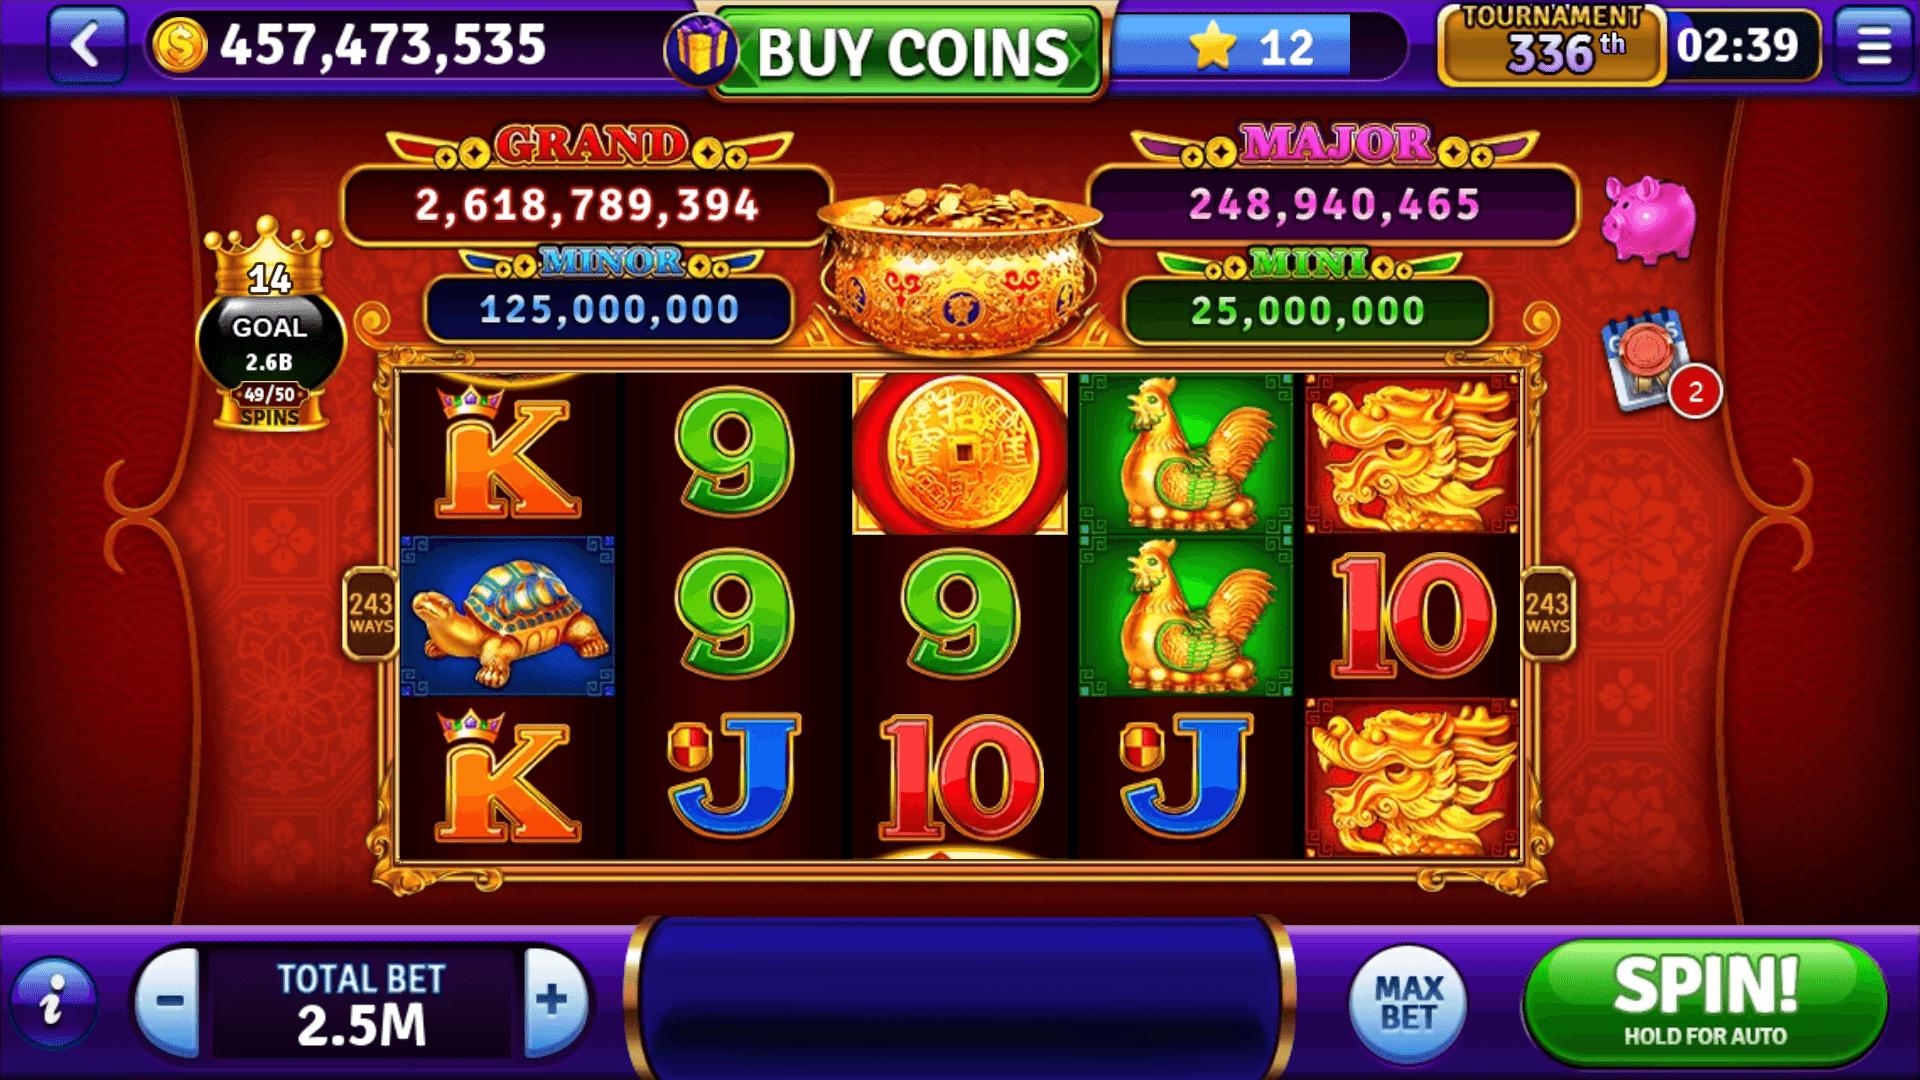 Jackpots popular machines - 70146